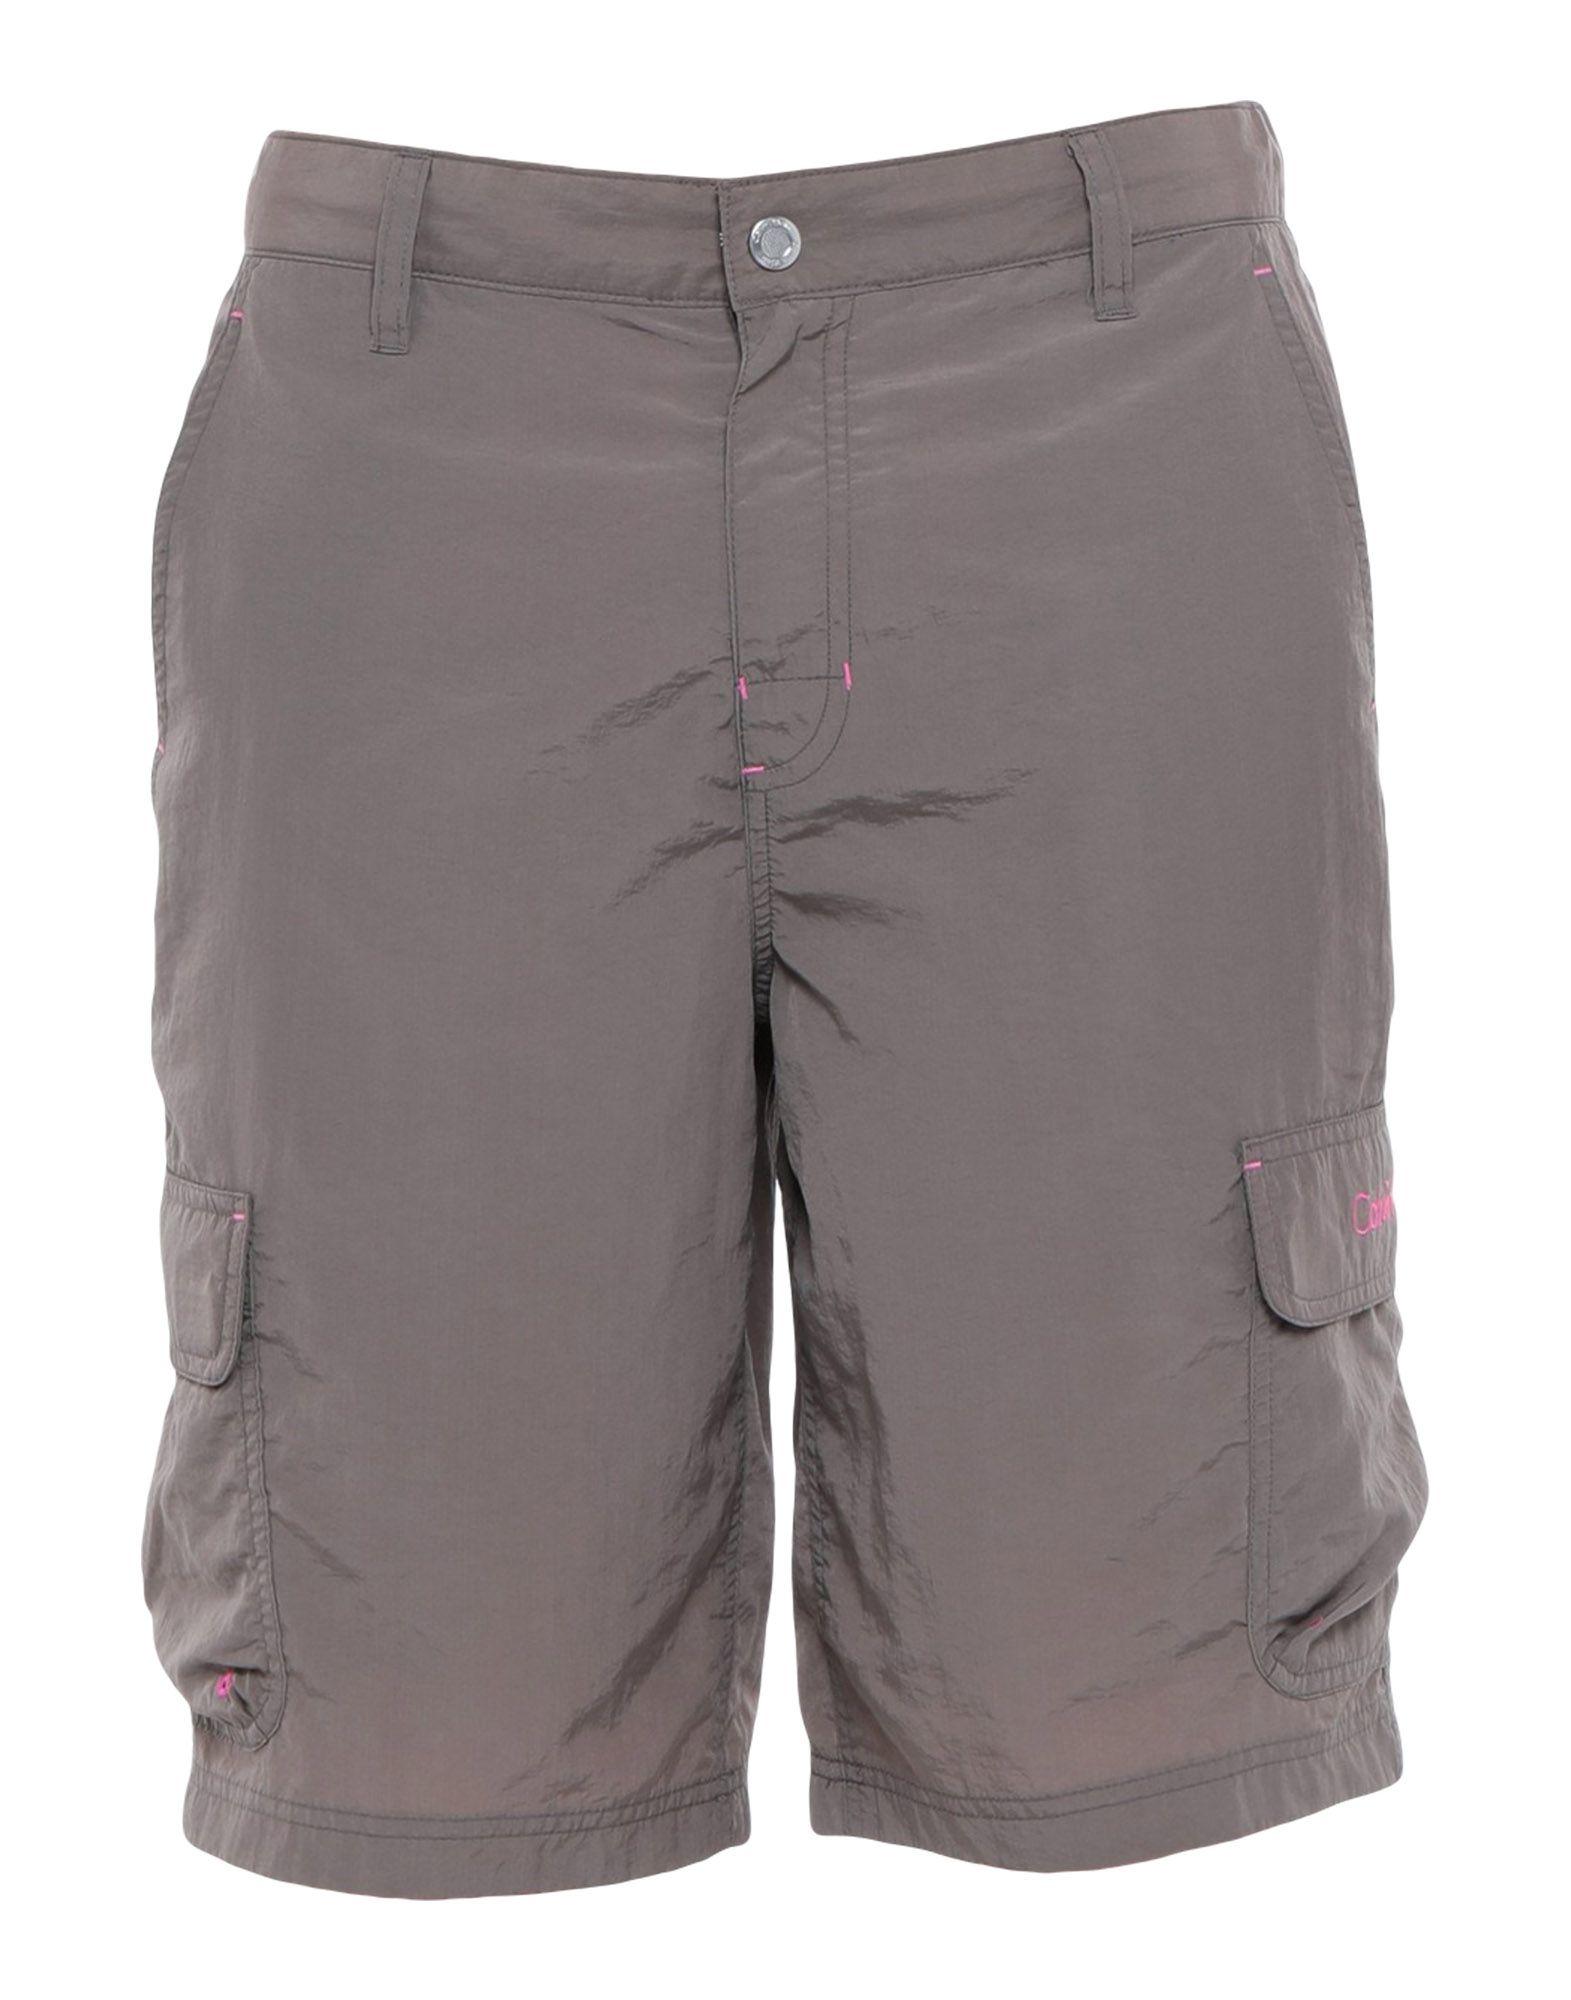 CALVIN KLEIN Пляжные брюки и шорты adidas пляжные брюки и шорты